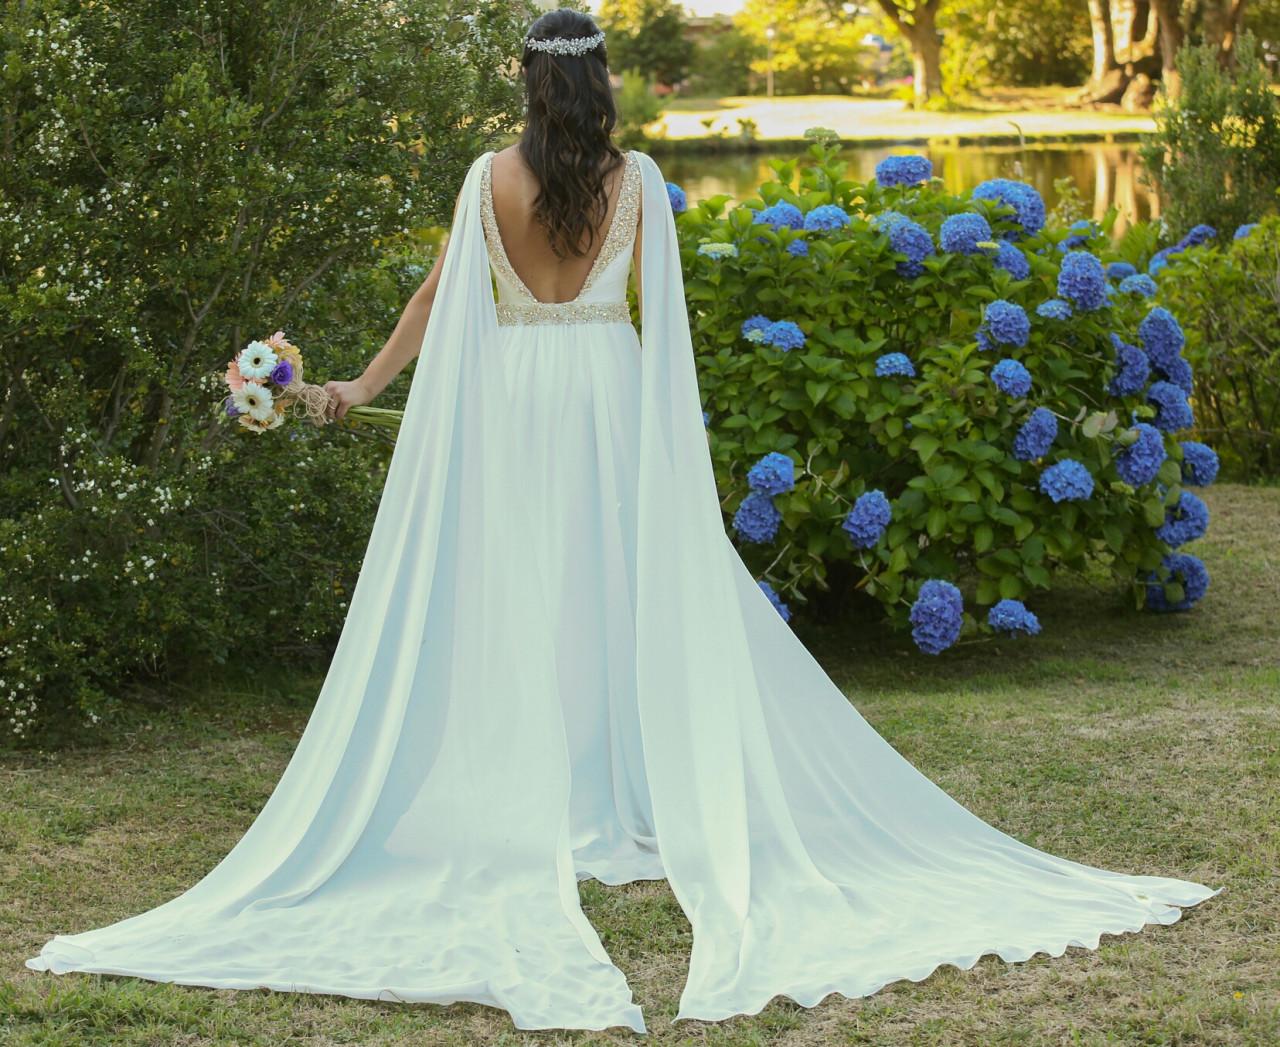 fe5838ae2e Catálogo de venta de vestidos de novia usados en Chile